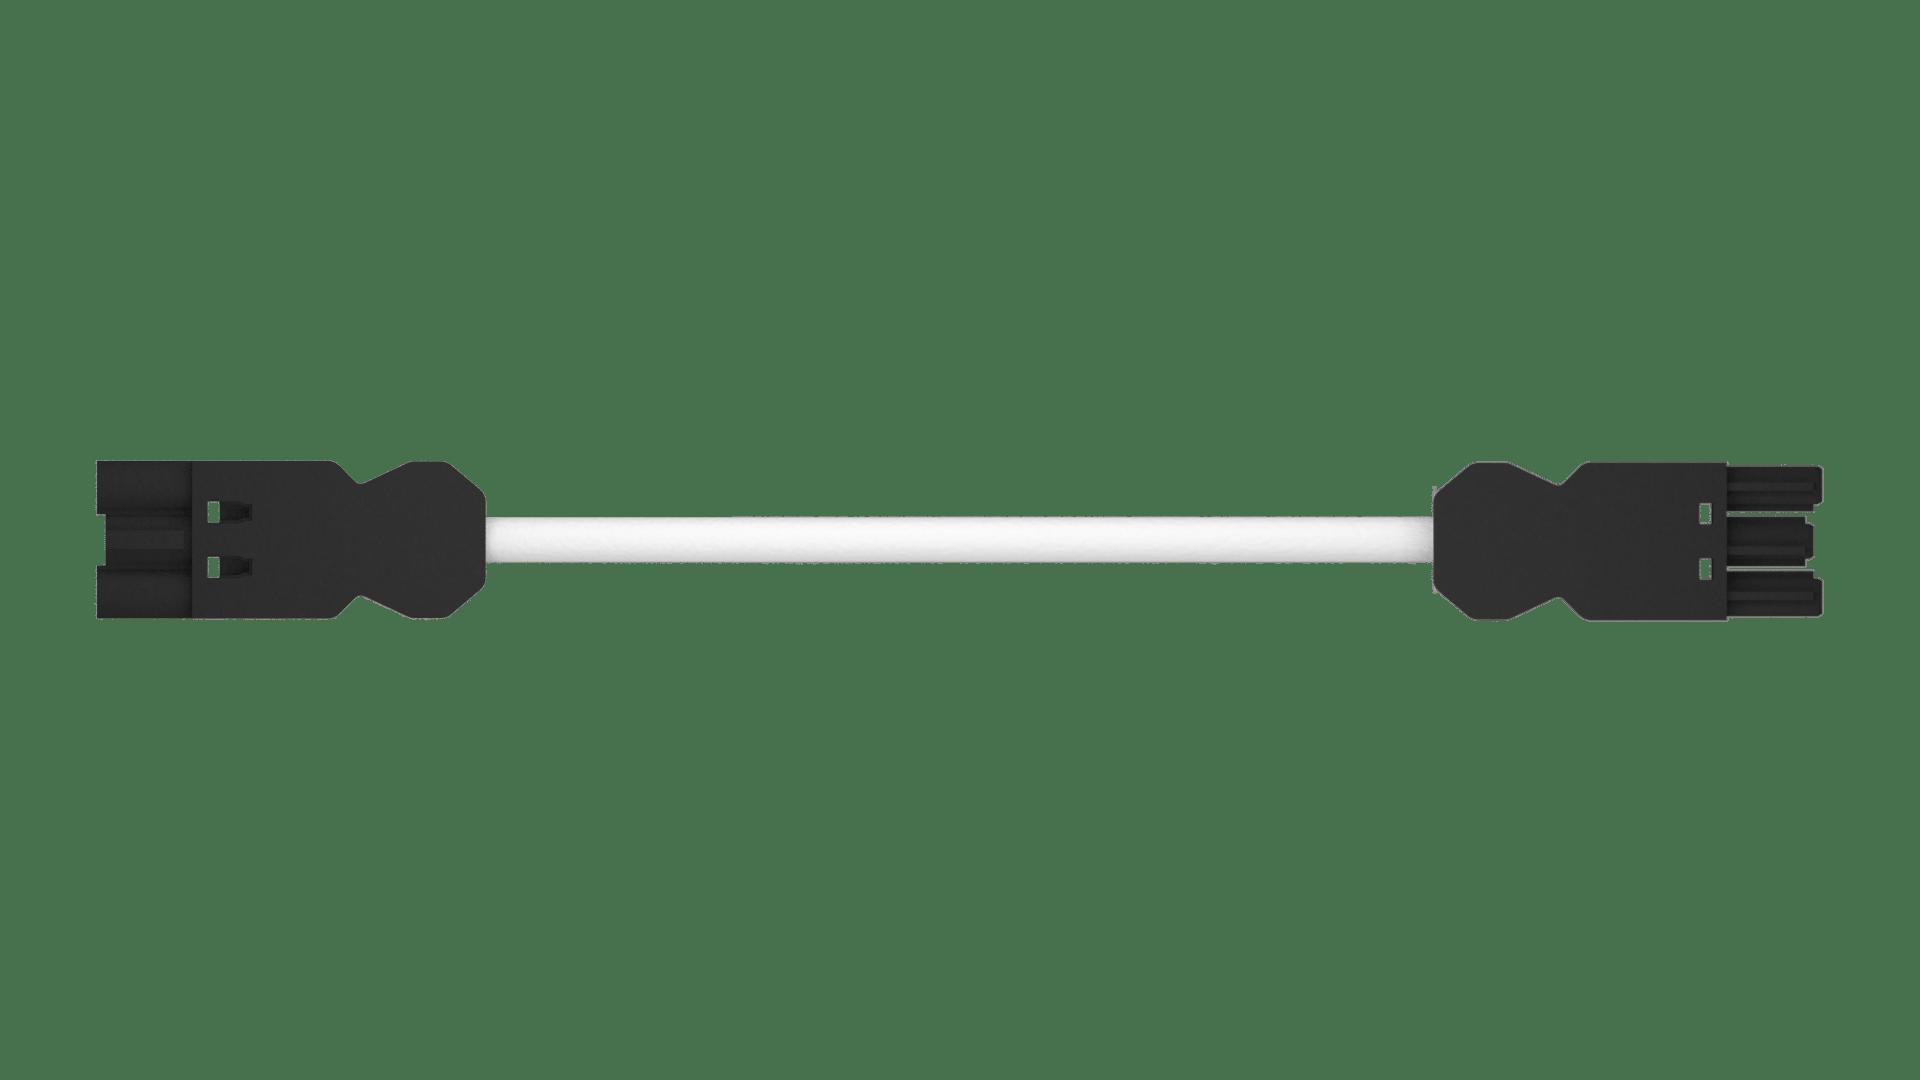 Cable inicio 1 conector WA 1M 3P negro final 1 conector WA 1H 3P negro_HR_zoom x6